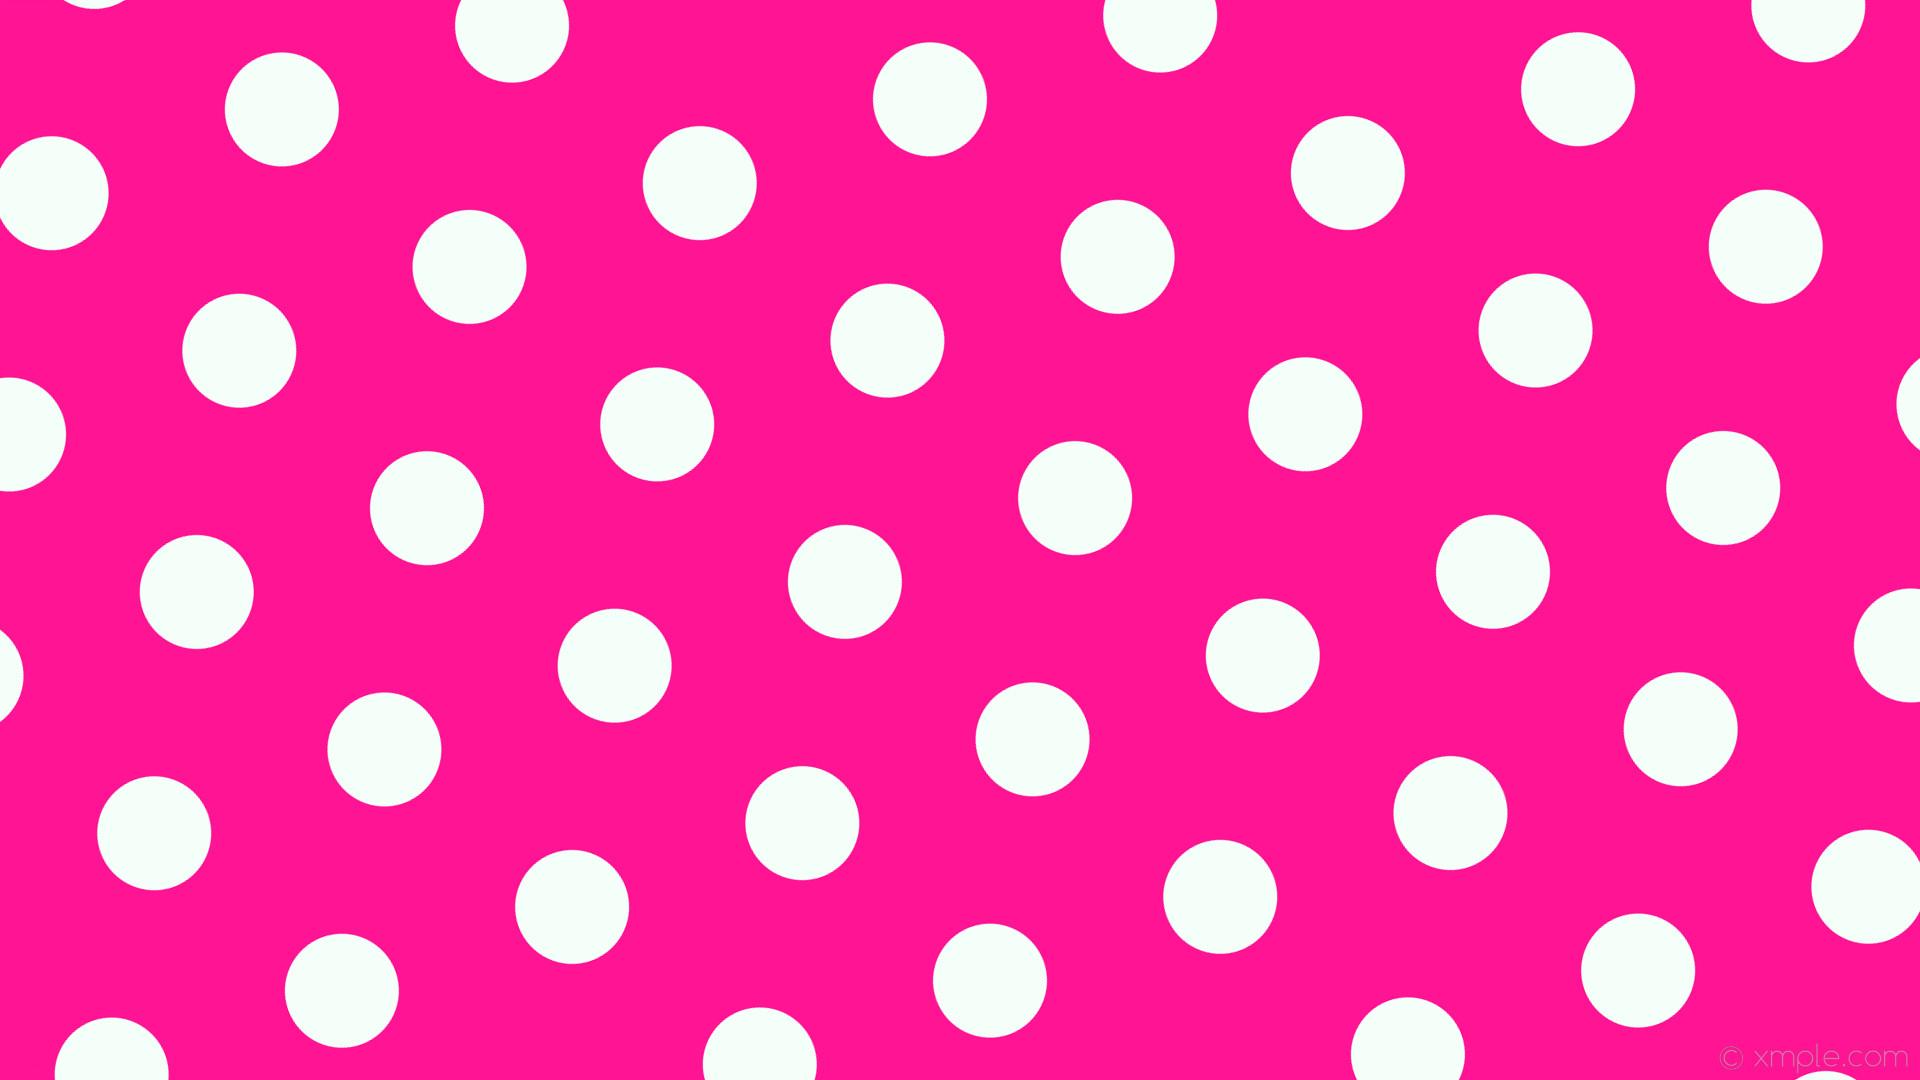 wallpaper hexagon pink polka dots white deep pink mint cream #ff1493  #f5fffa diagonal 20